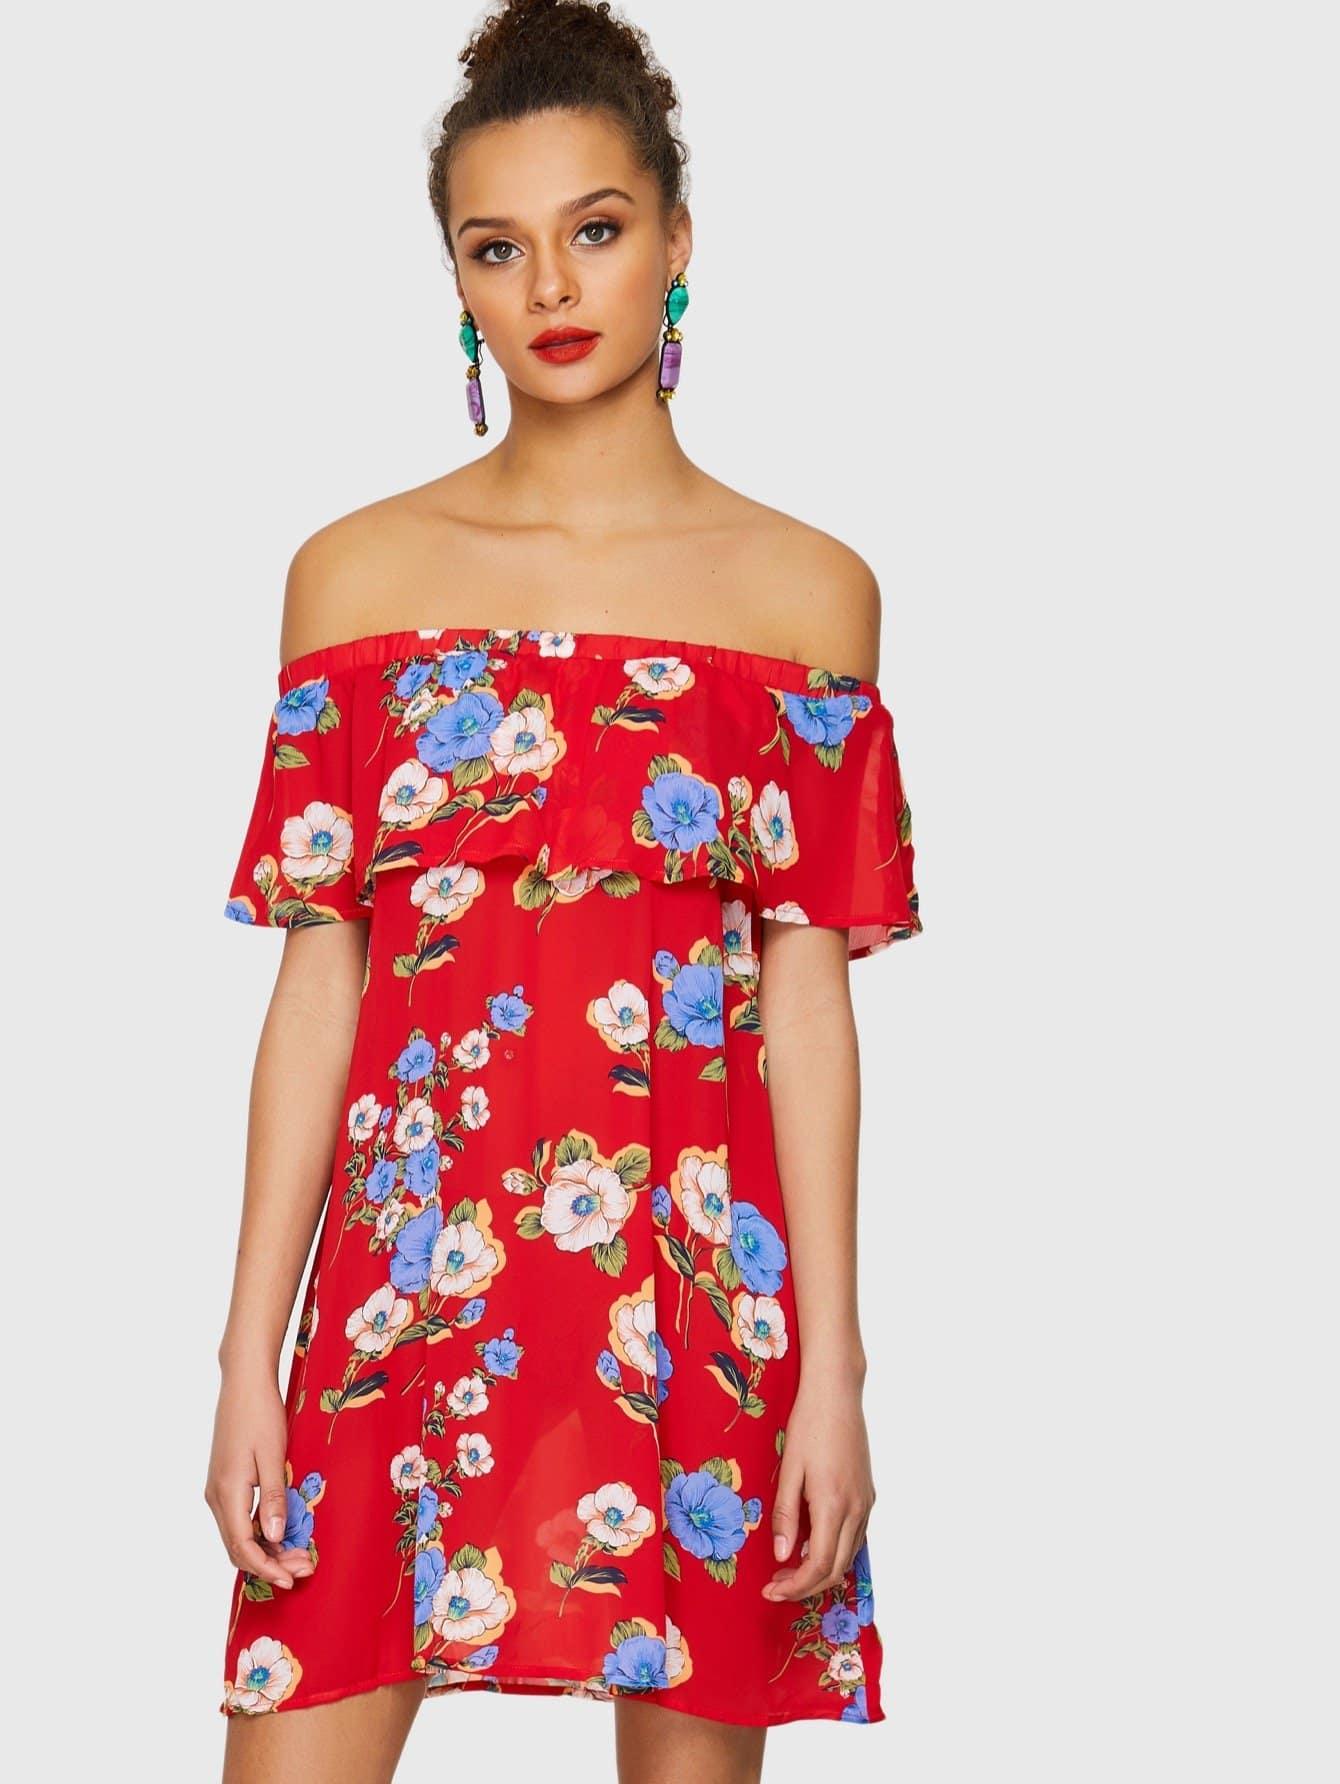 Flower Print Foldover Front Bardot Dress contrast collar foldover front dress